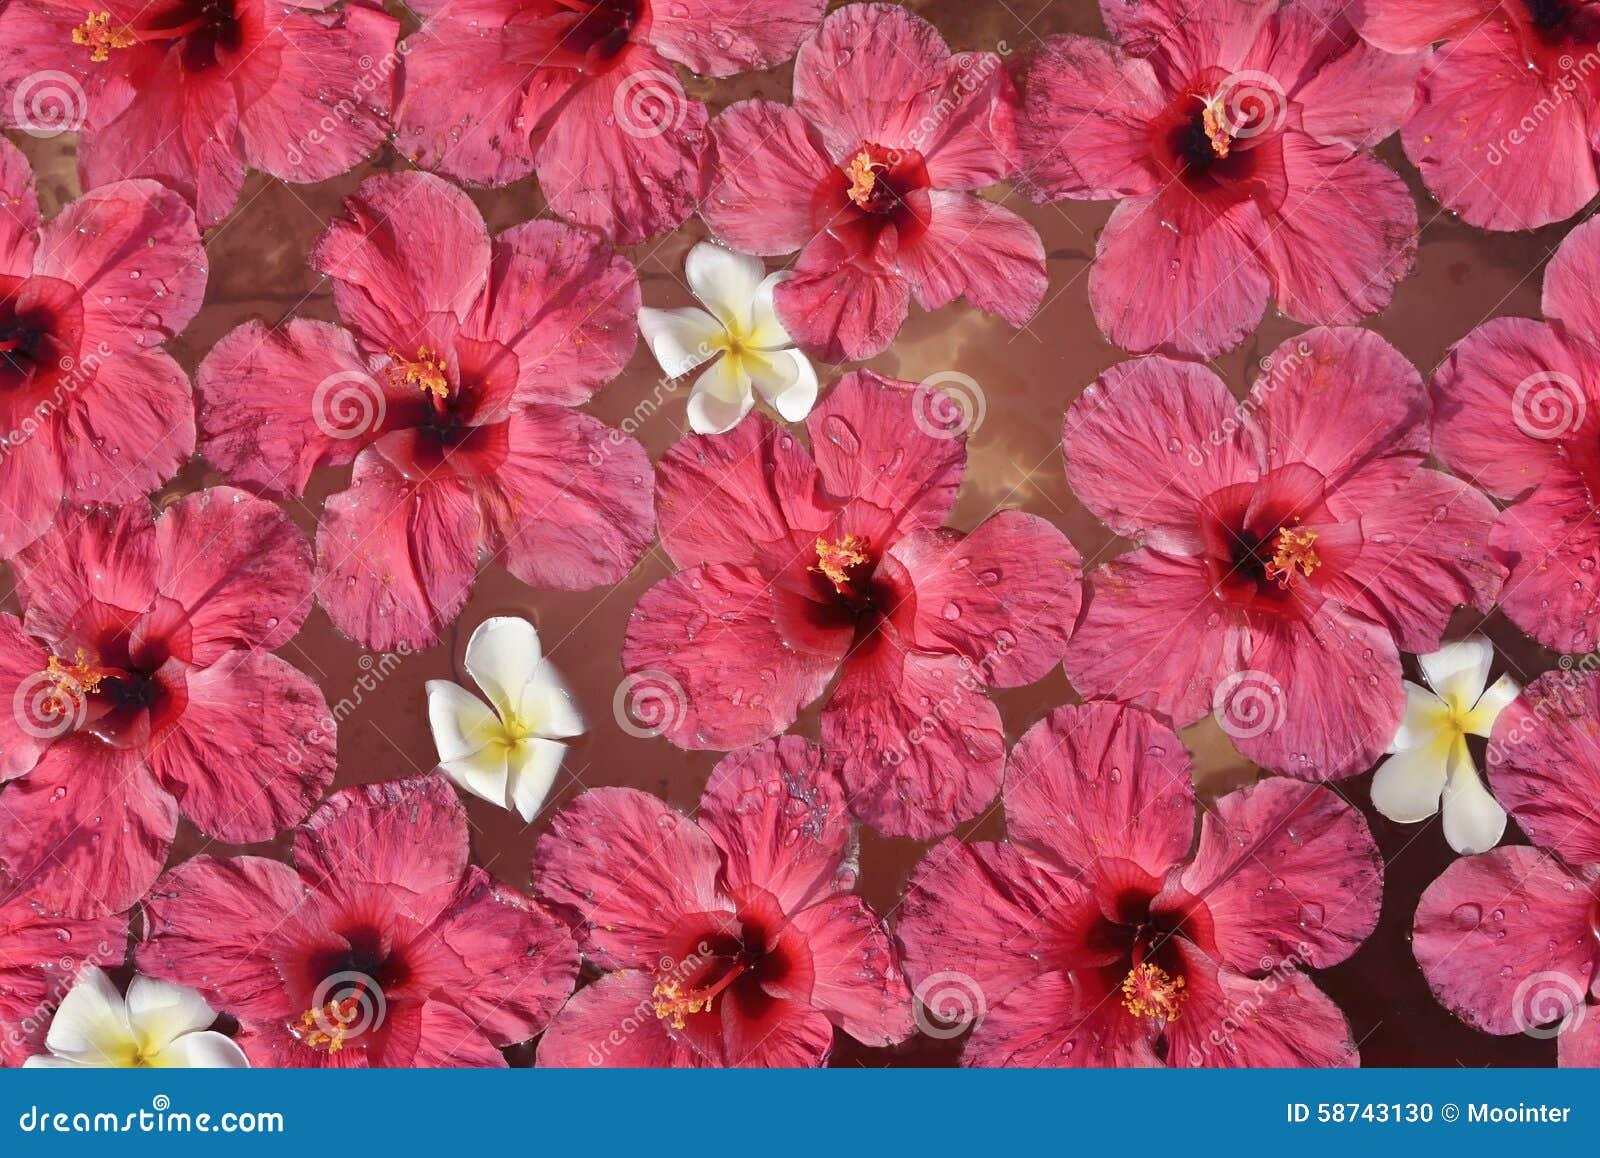 Hibiscus Flowers Stock Photo Image Of Ripple Romance 58743130